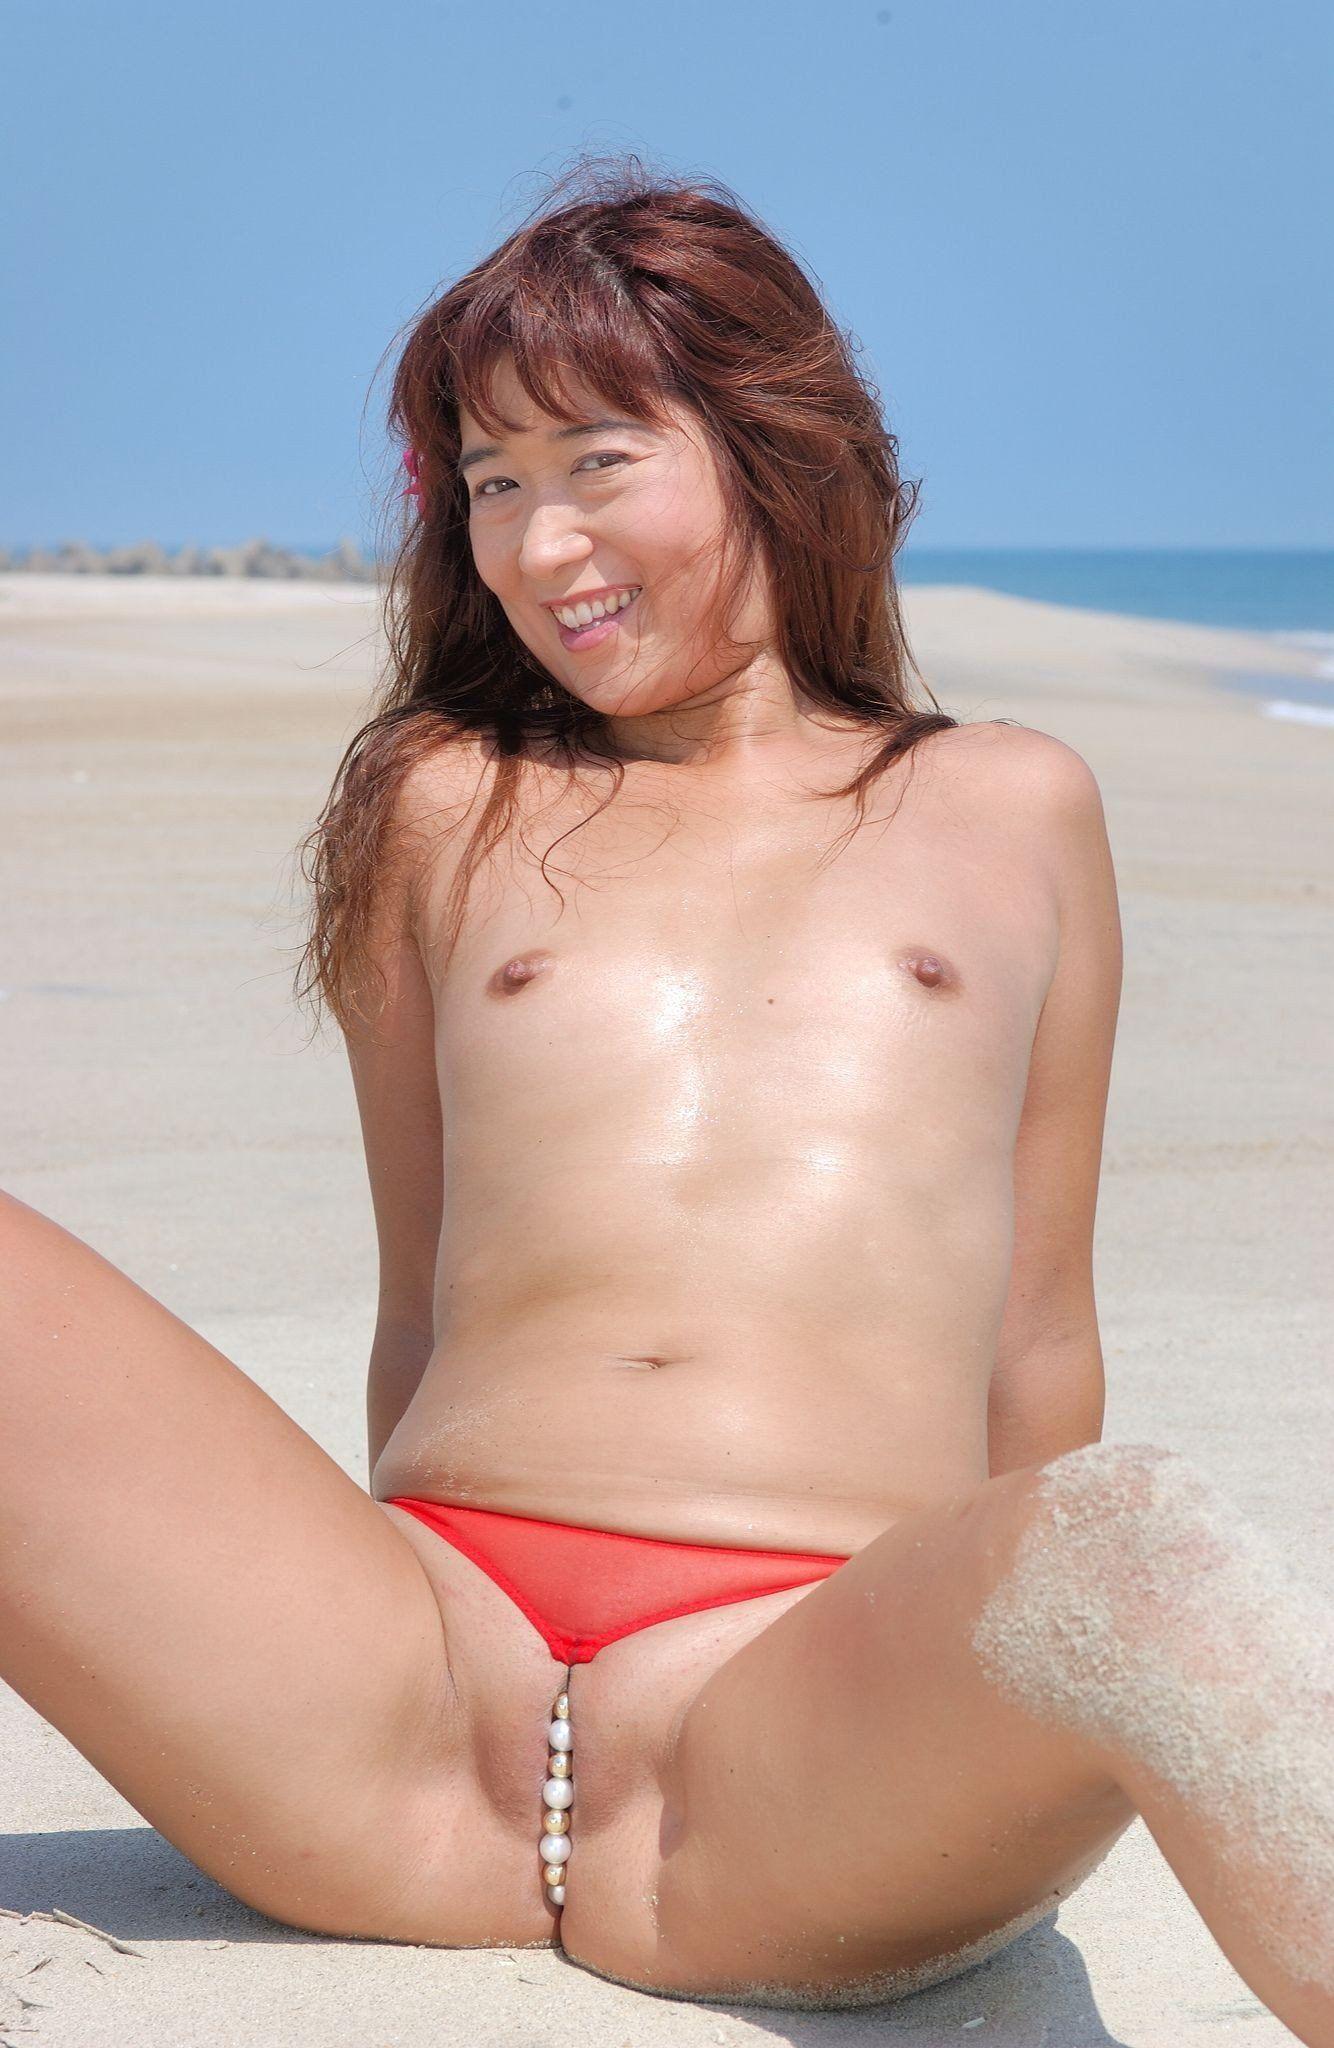 asian bikini free porn . porn pics & moveis. comments: 2